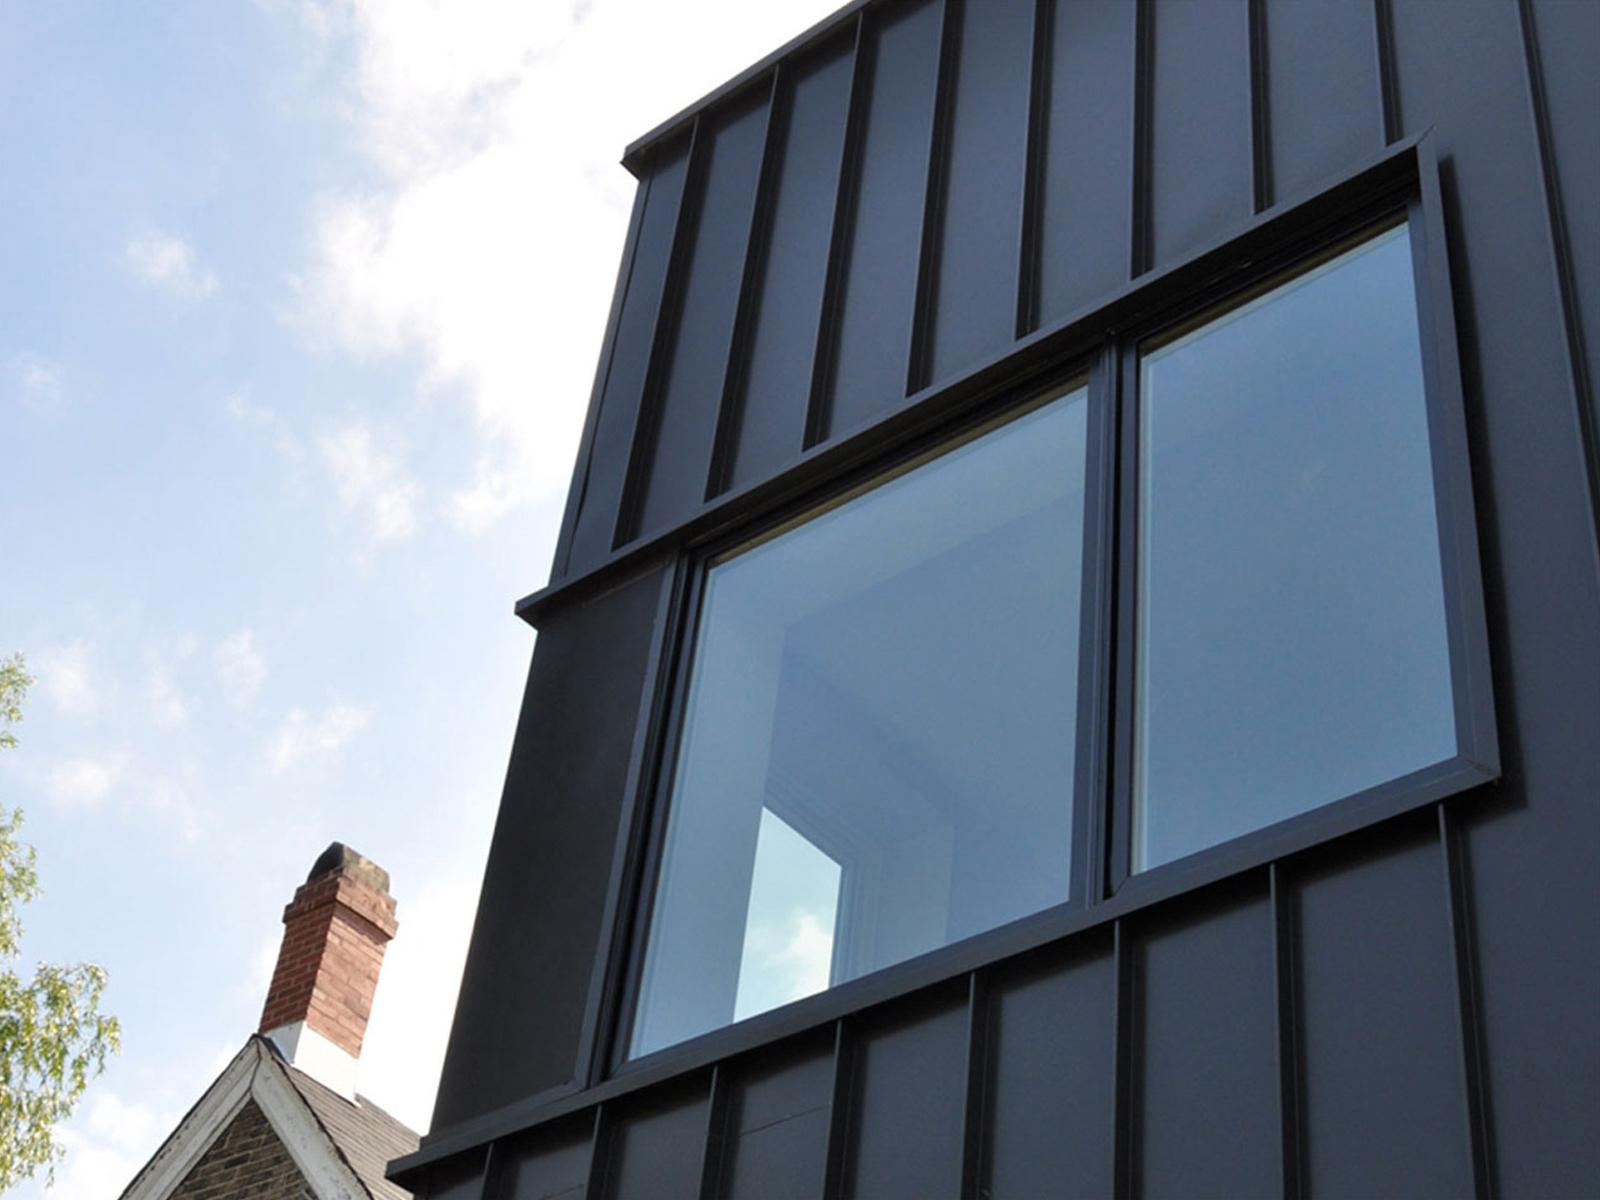 Corner windows bring light into an upstairs bedroom